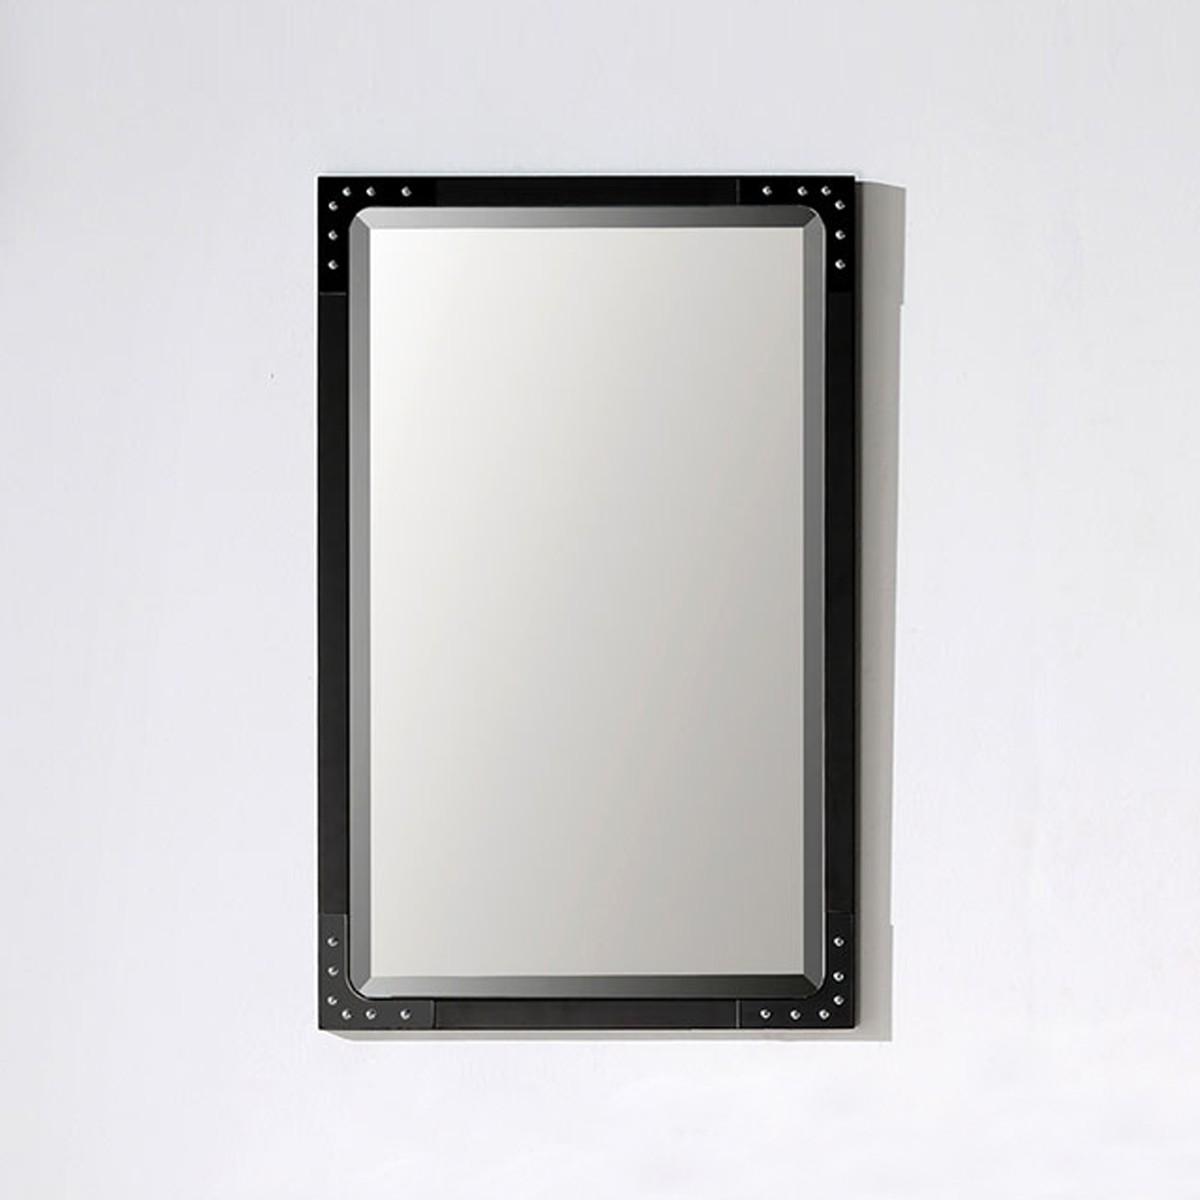 30 po Miroir pour Meuble Salle de Bain (DK-5730-B)